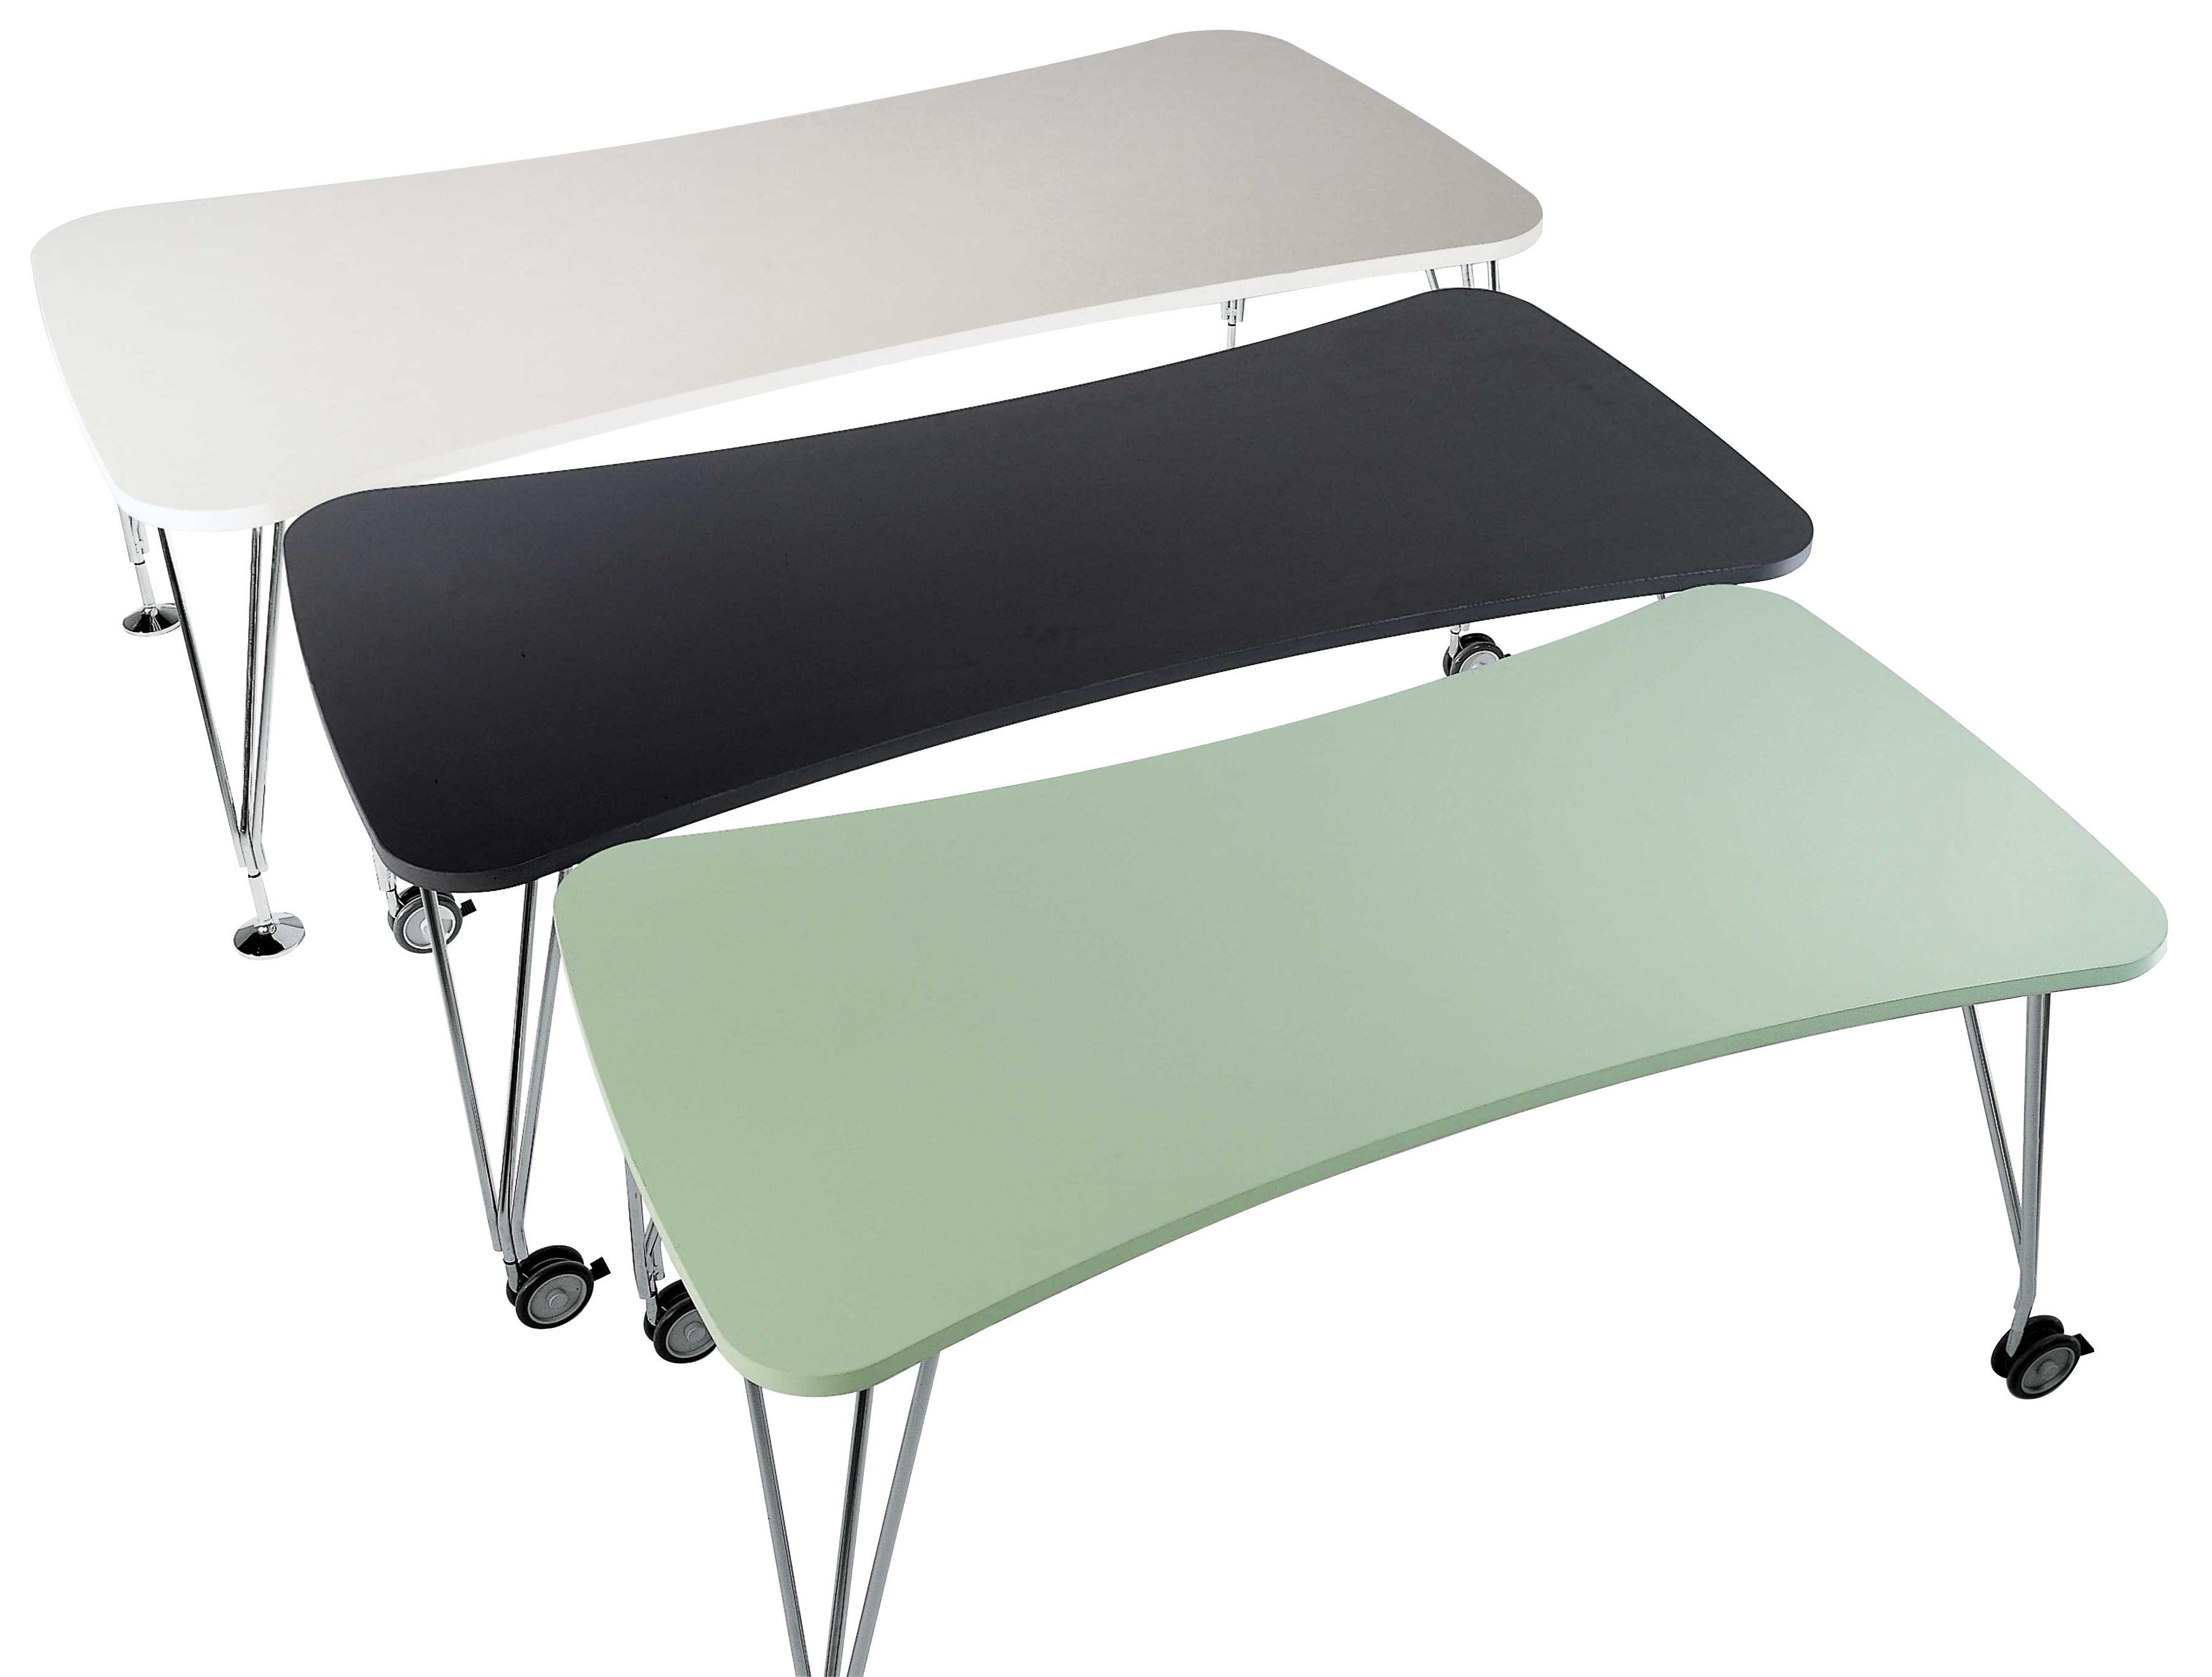 Furniture - Teen furniture - Max Rectangular table - With feet - 160 cm by Kartell - slate 160 cm - Chromed steel, Laminate